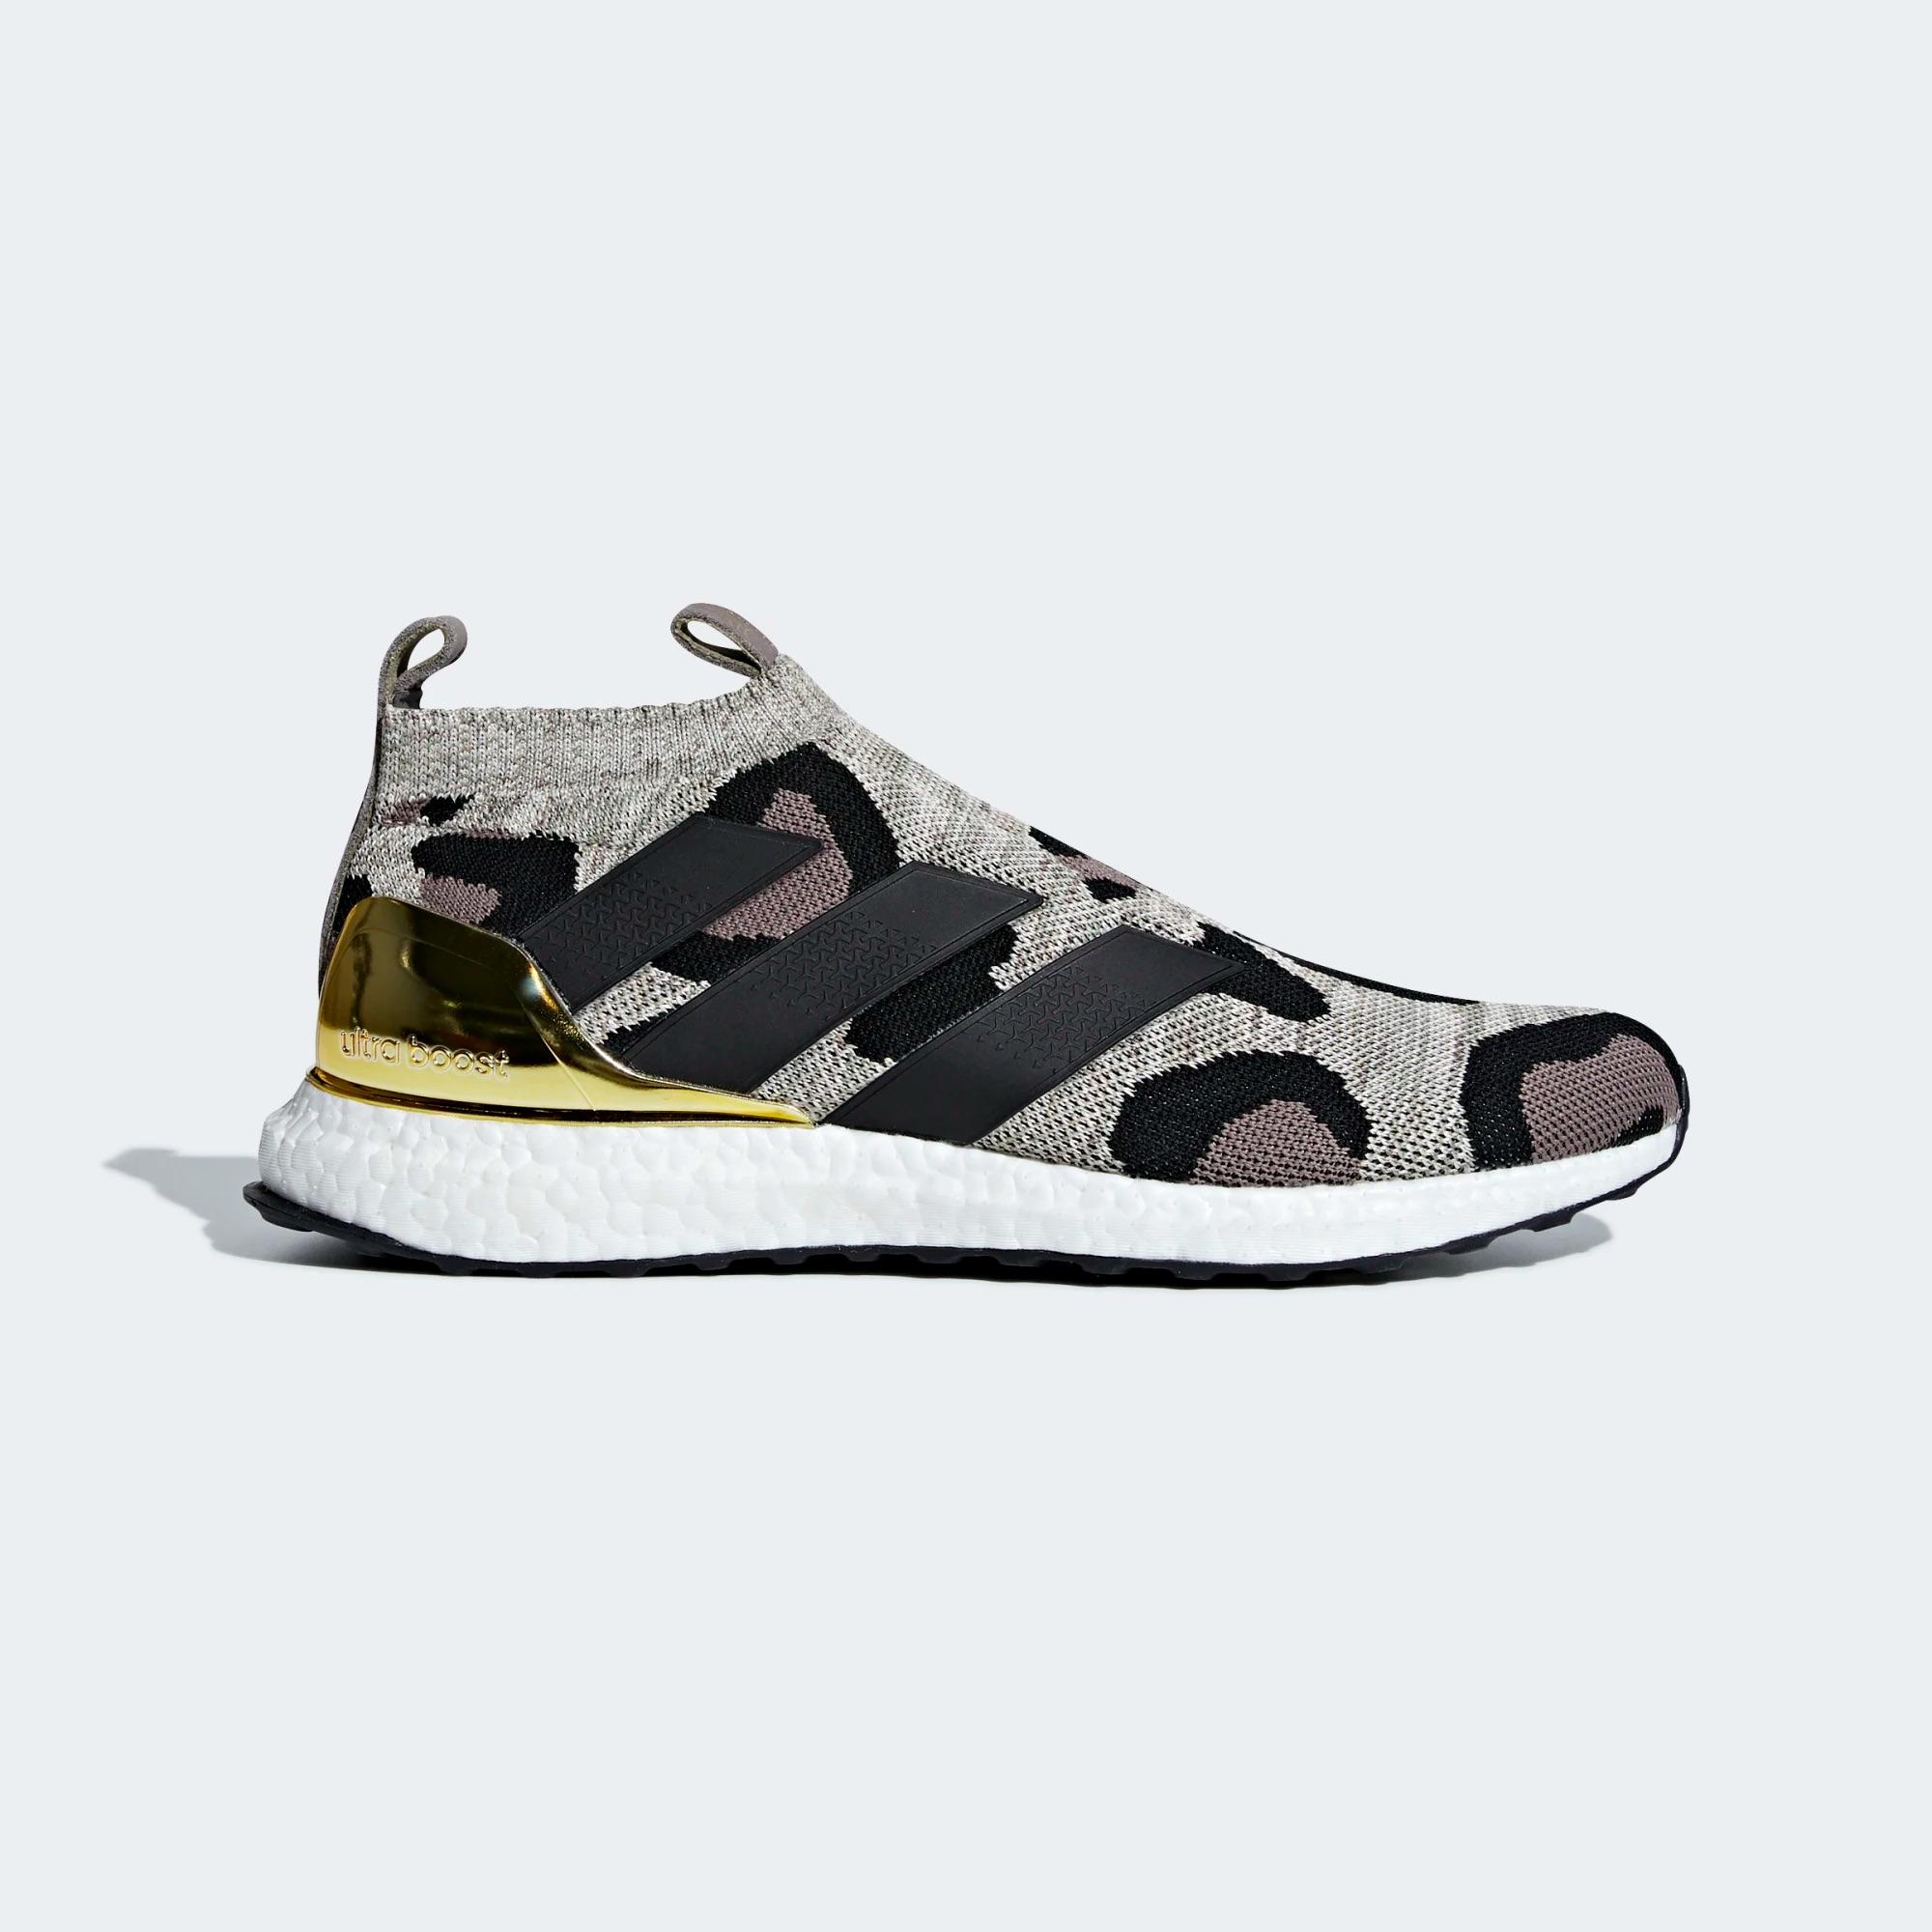 Adidas官网:Ultraboost只卖$82.50